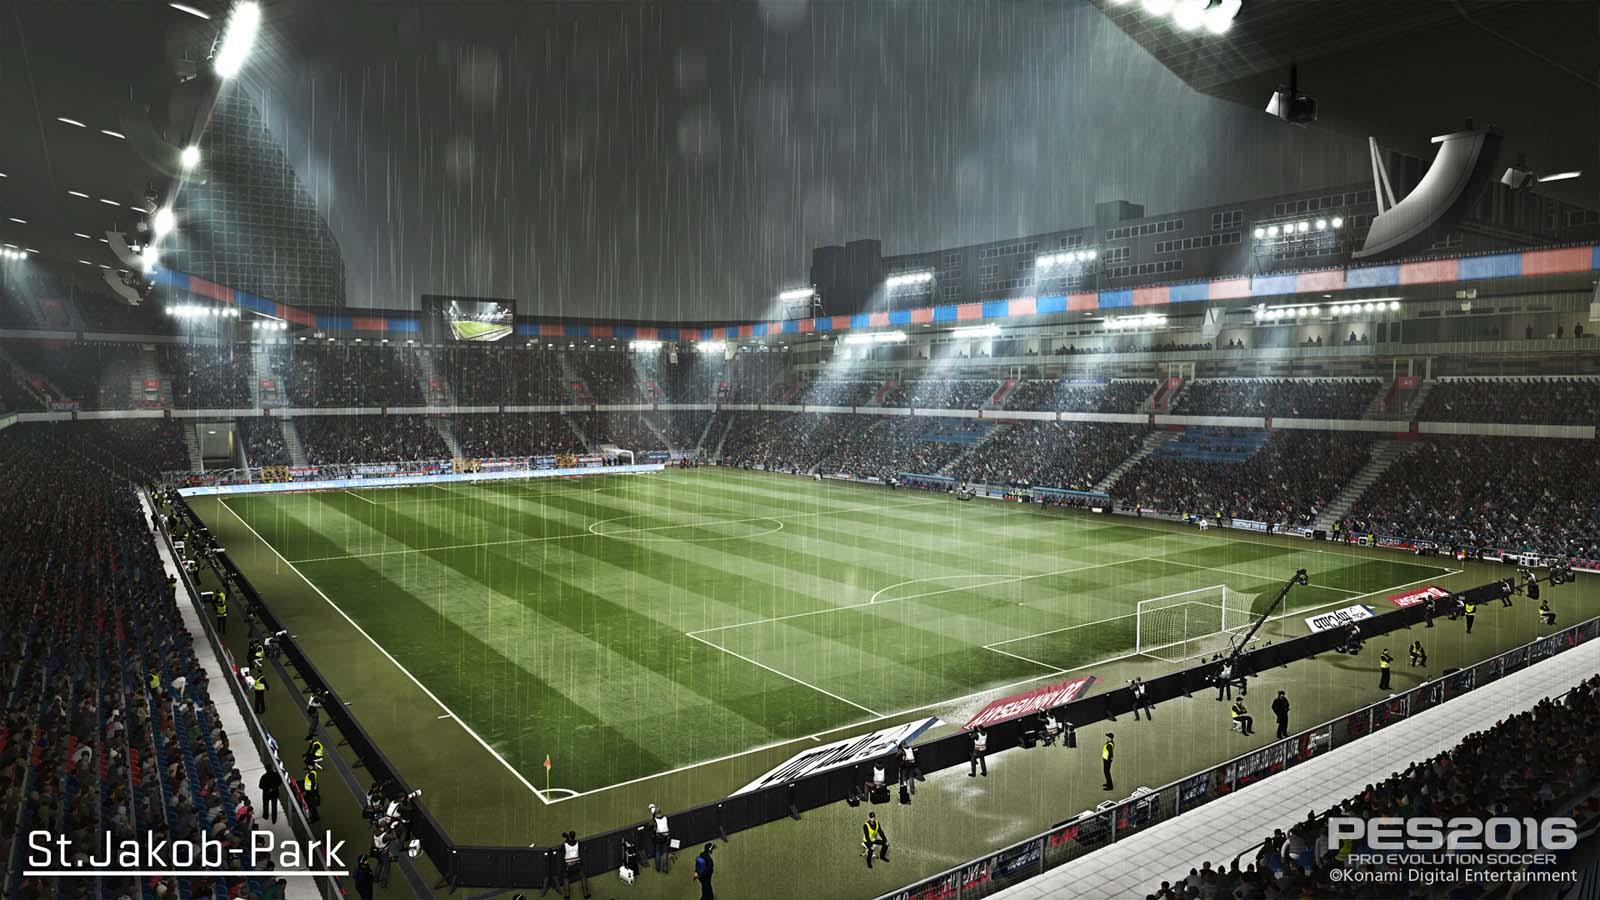 pes-2016-gamescom-Stadium-St_1438752433.